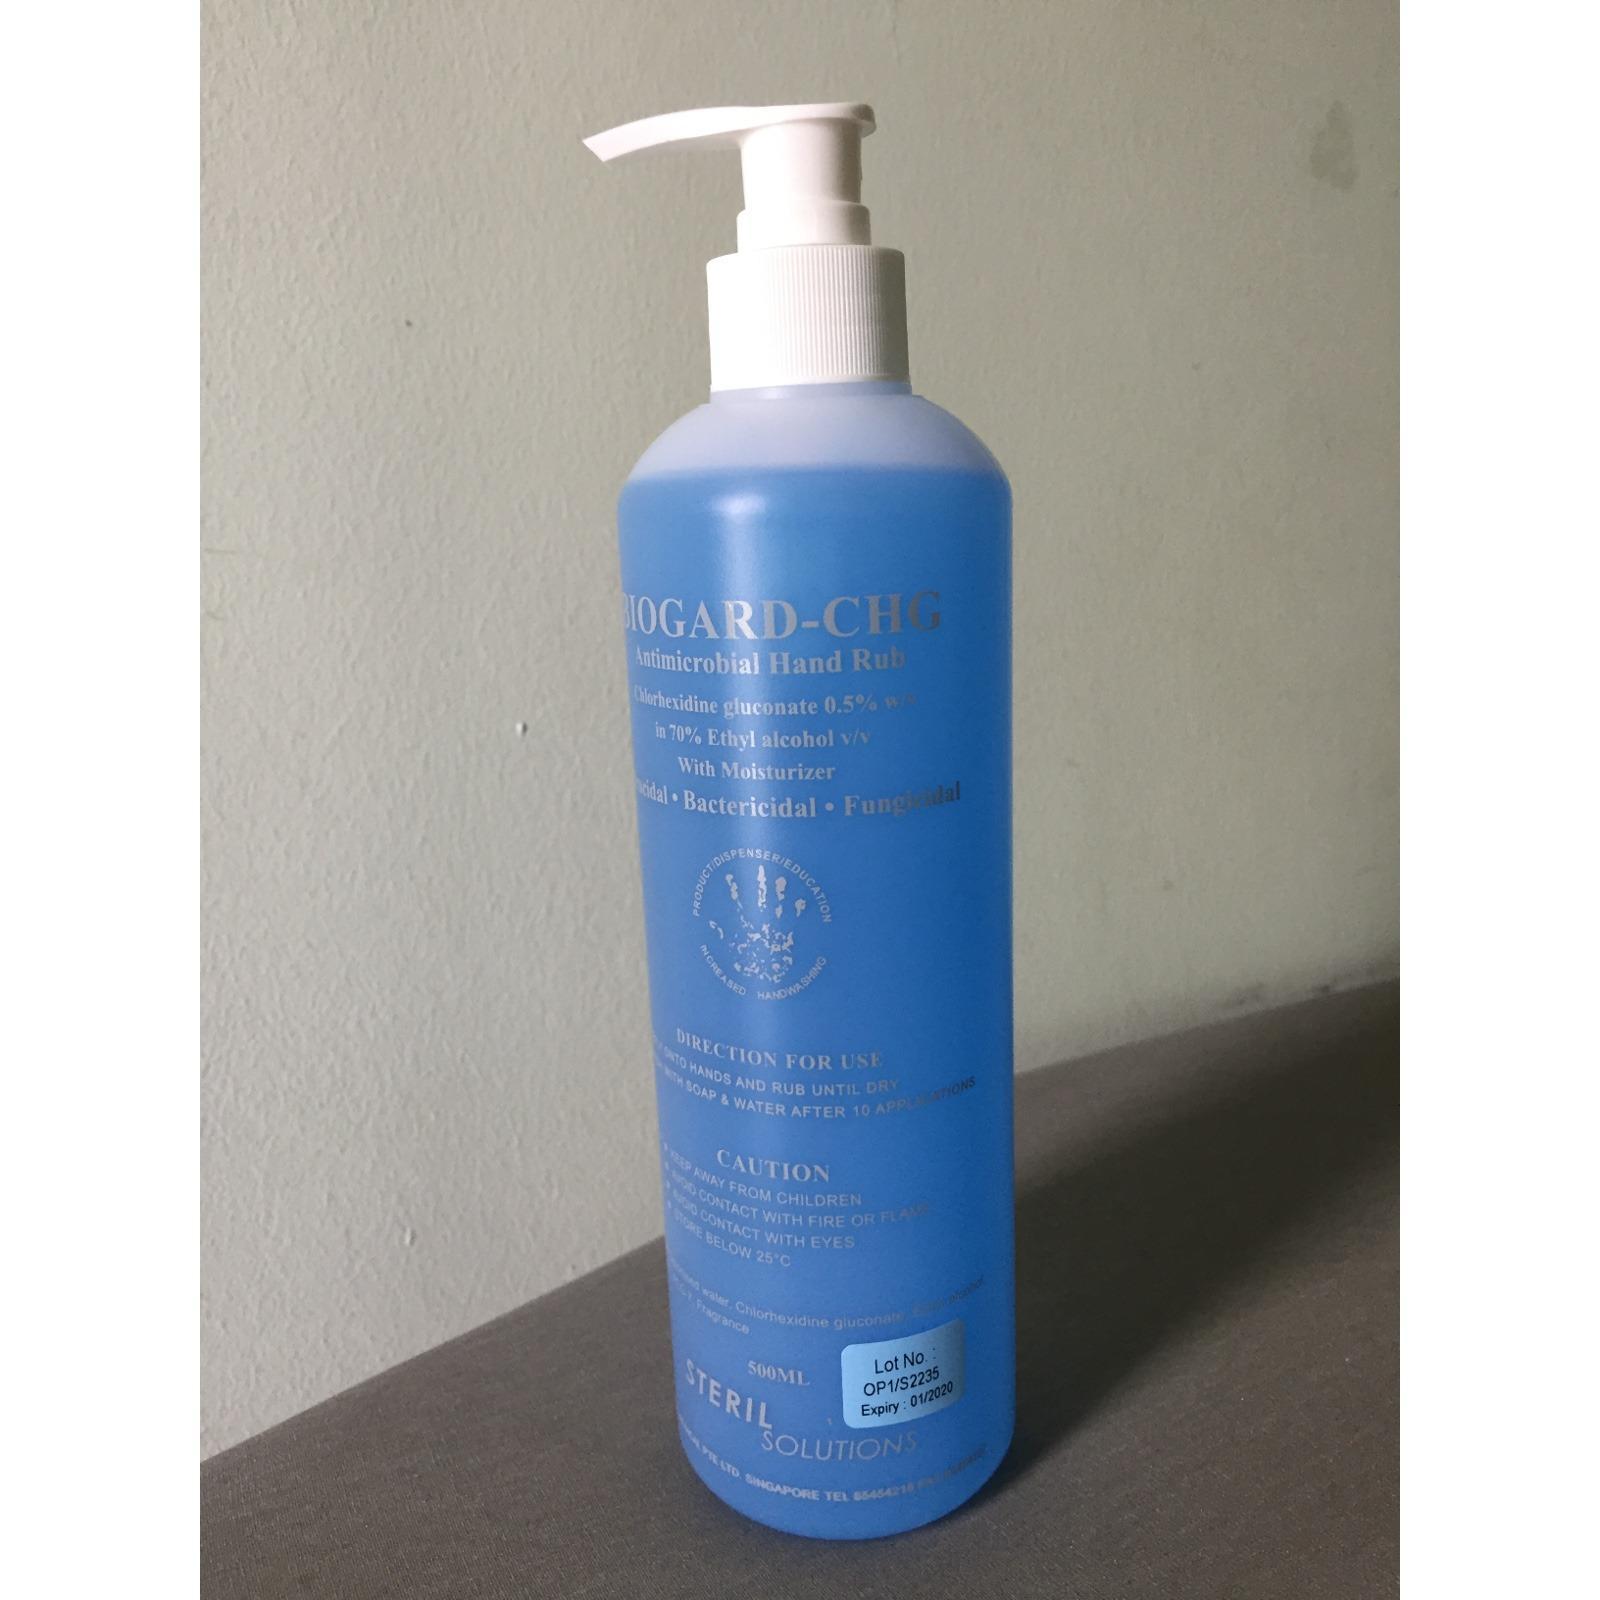 Hand Sanitizers Source · Biogard CHG Hand Sanitizer Hand Rub. Biogard CHG Hand Sanitizer Hand Rub. My Baby Moms Hand Sanitizer 60 Ml ...